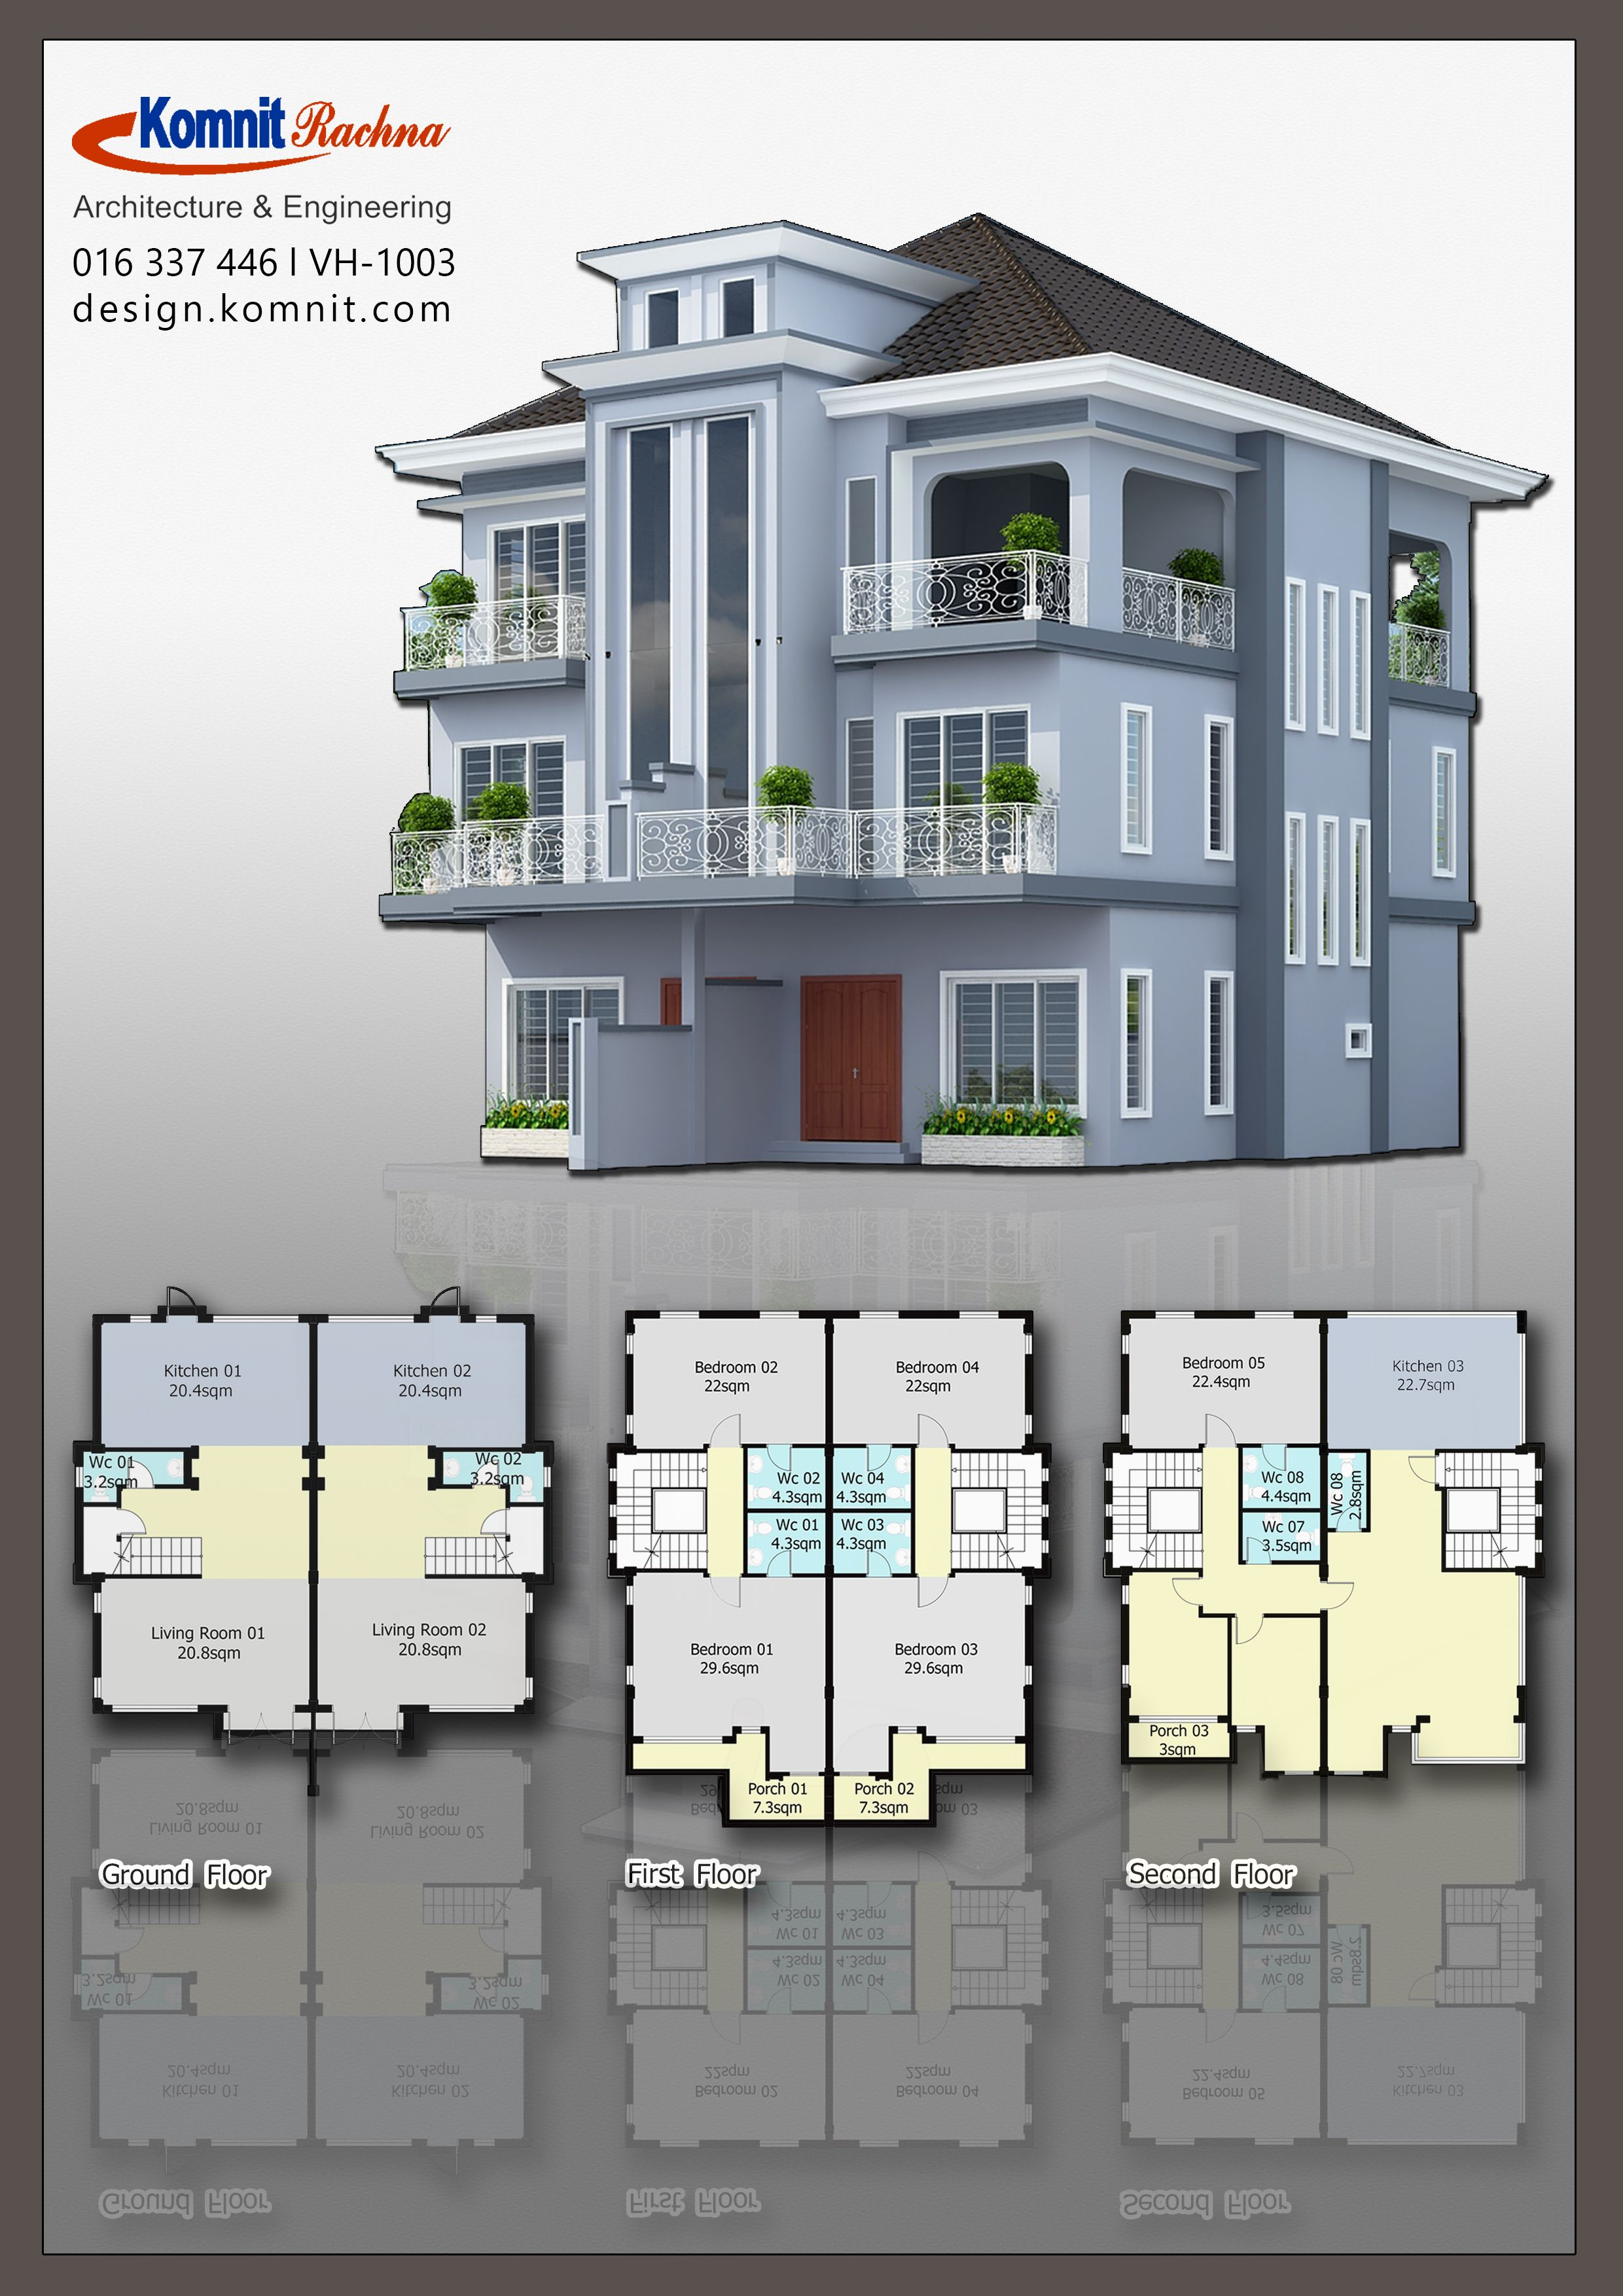 Vt K008 Vh 1003 Villas Komnit Khmer In Phnom Penh Cambodia House Blueprints Minecraft Modern House Blueprints Architectural House Plans